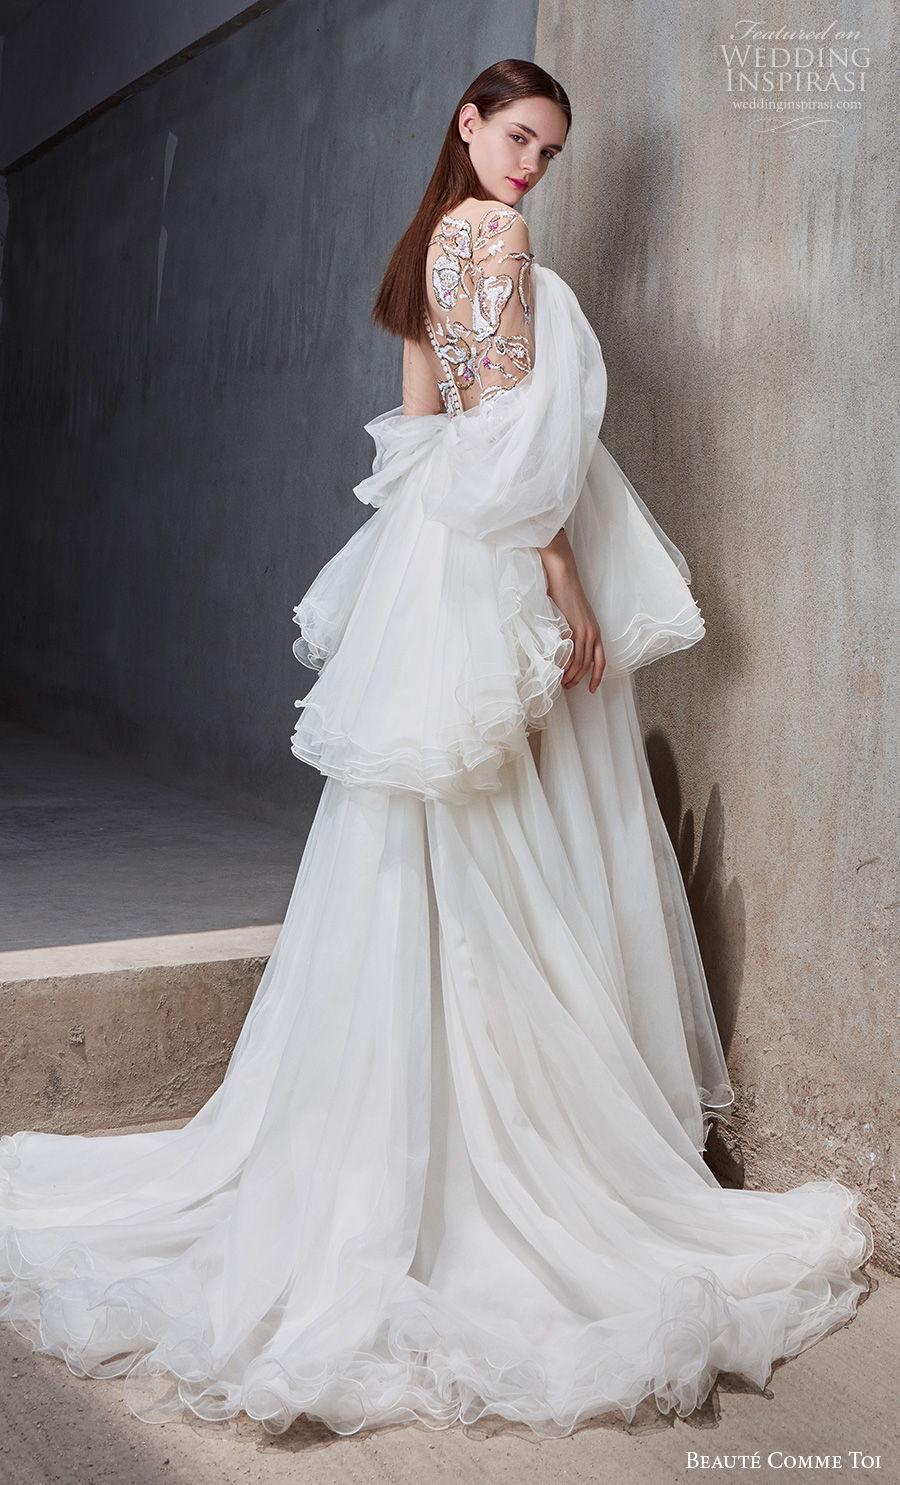 beaute comme toi 2021 bridal cold shoulder bateau neckline heavily embellished bodice slit skirt peplum grecian glamorous a  line wedding dress embellished back chapel train (josalyn) sdv